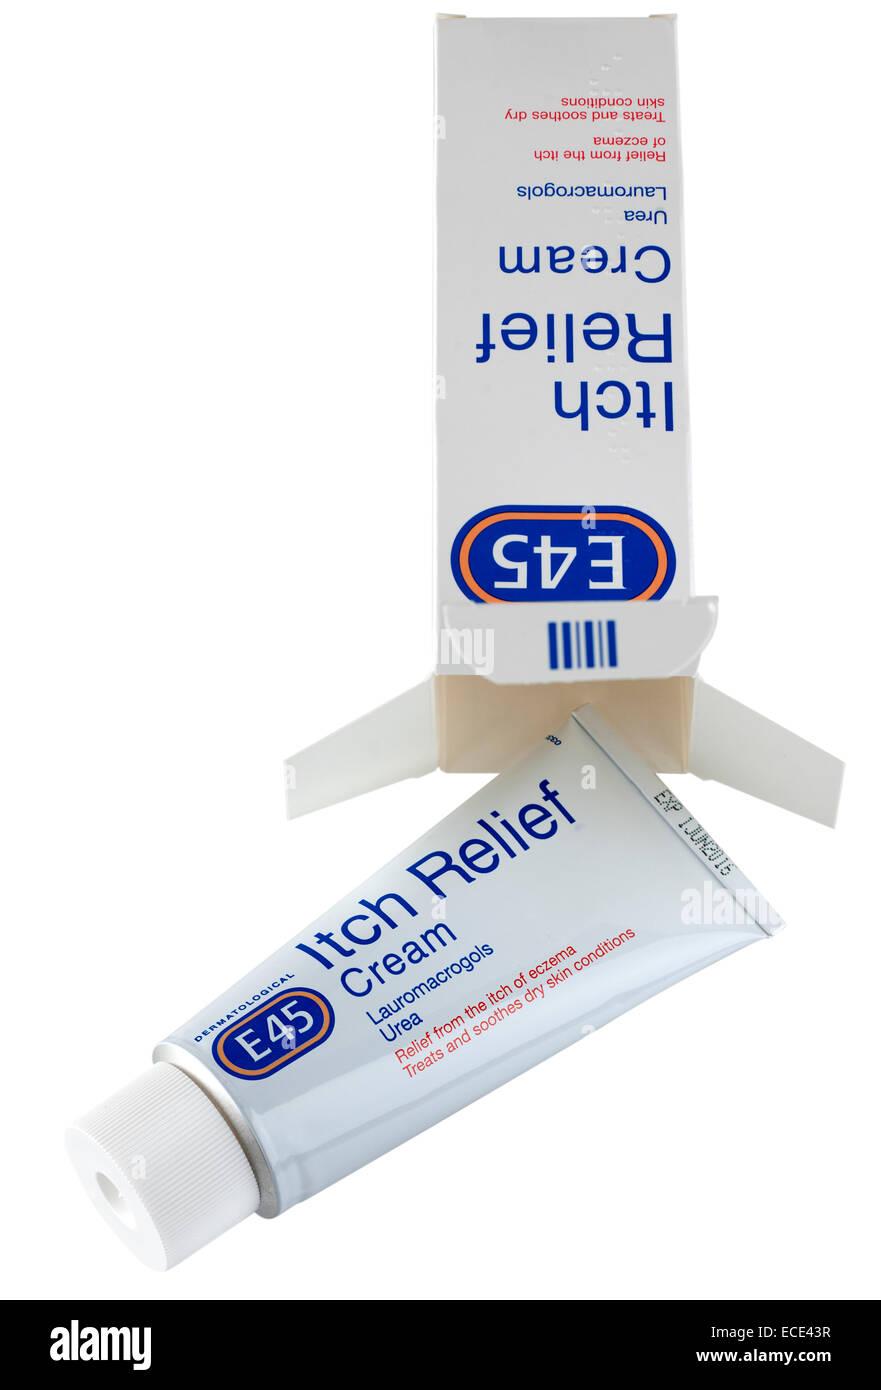 Tube of E45 cream itch relief  Lauromacrogols Urea - Stock Image